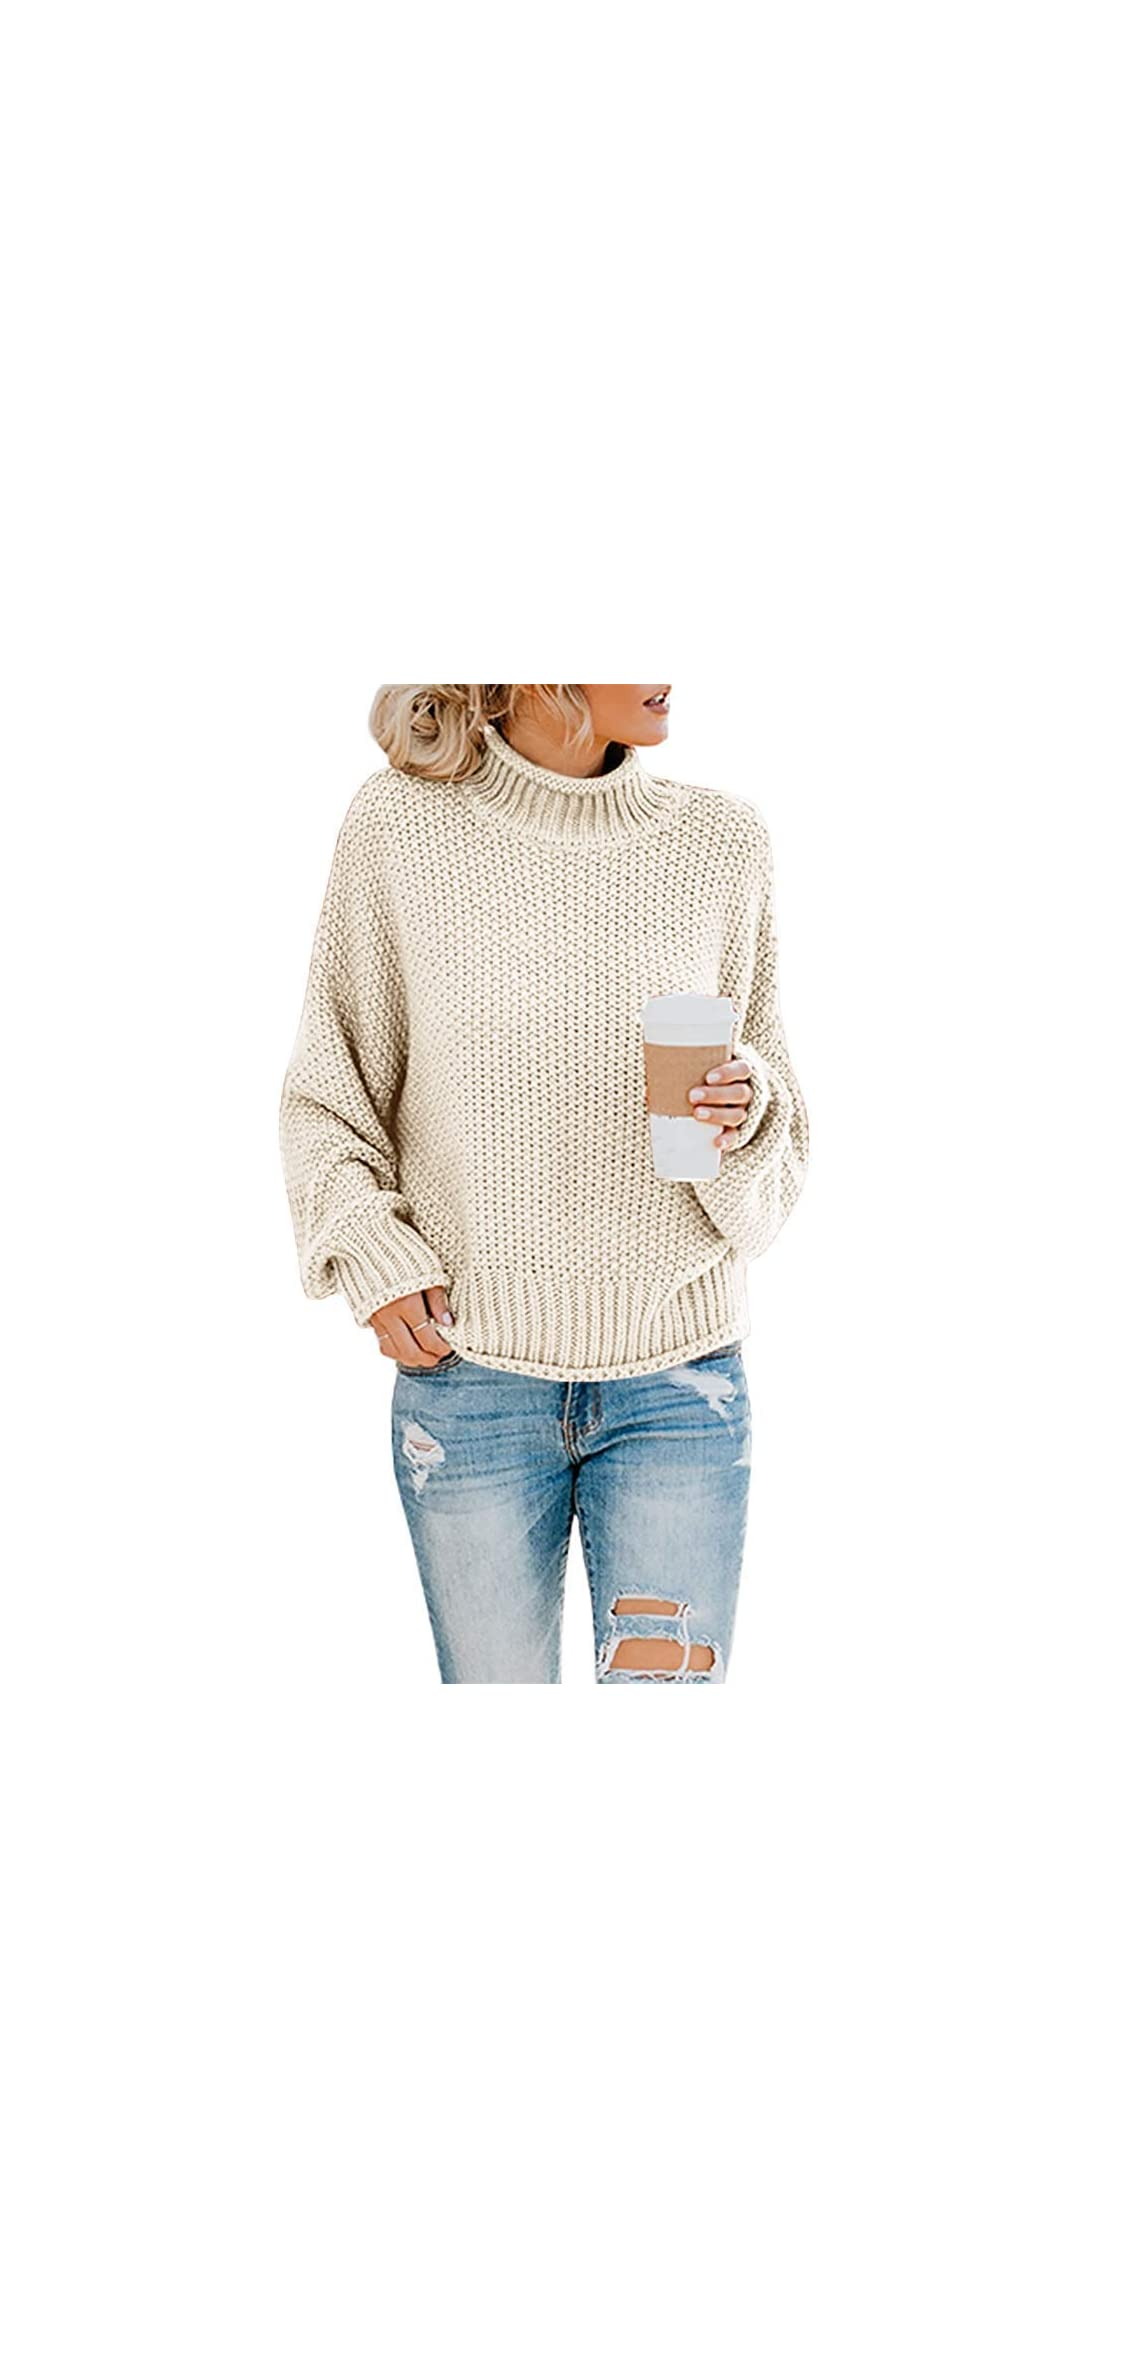 Womens Turtleneck Oversized Sweaters Long Sleeve Baggy